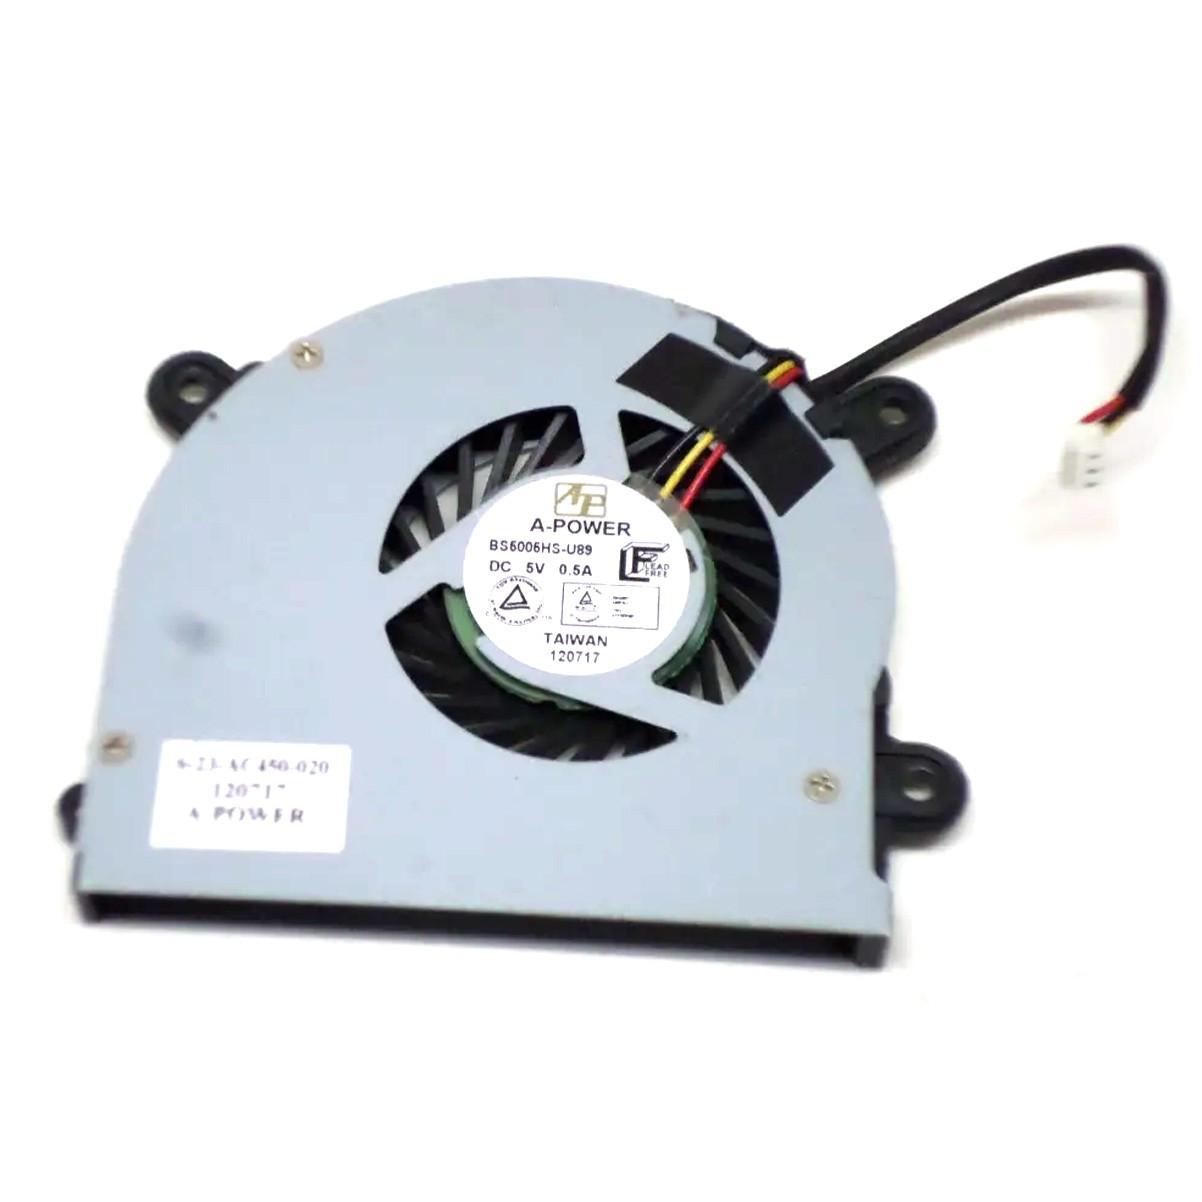 Cooler P/ Notebook Itautec Infoway A7520 PN:623ac450020 - Retirado